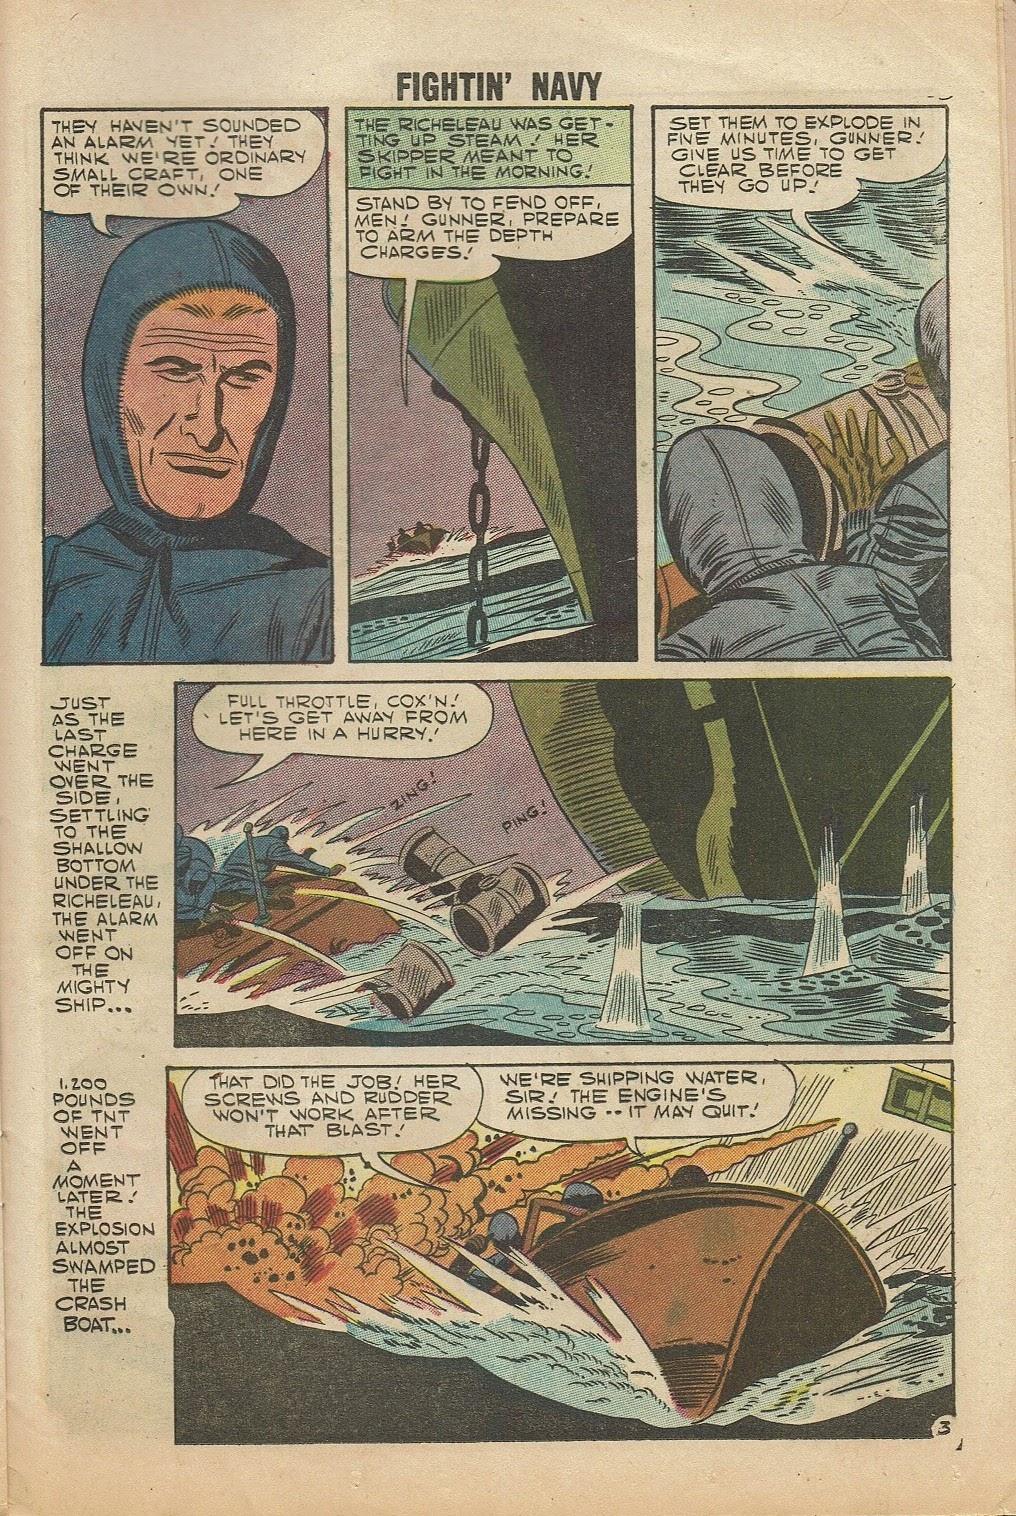 Read online Fightin' Navy comic -  Issue #81 - 25